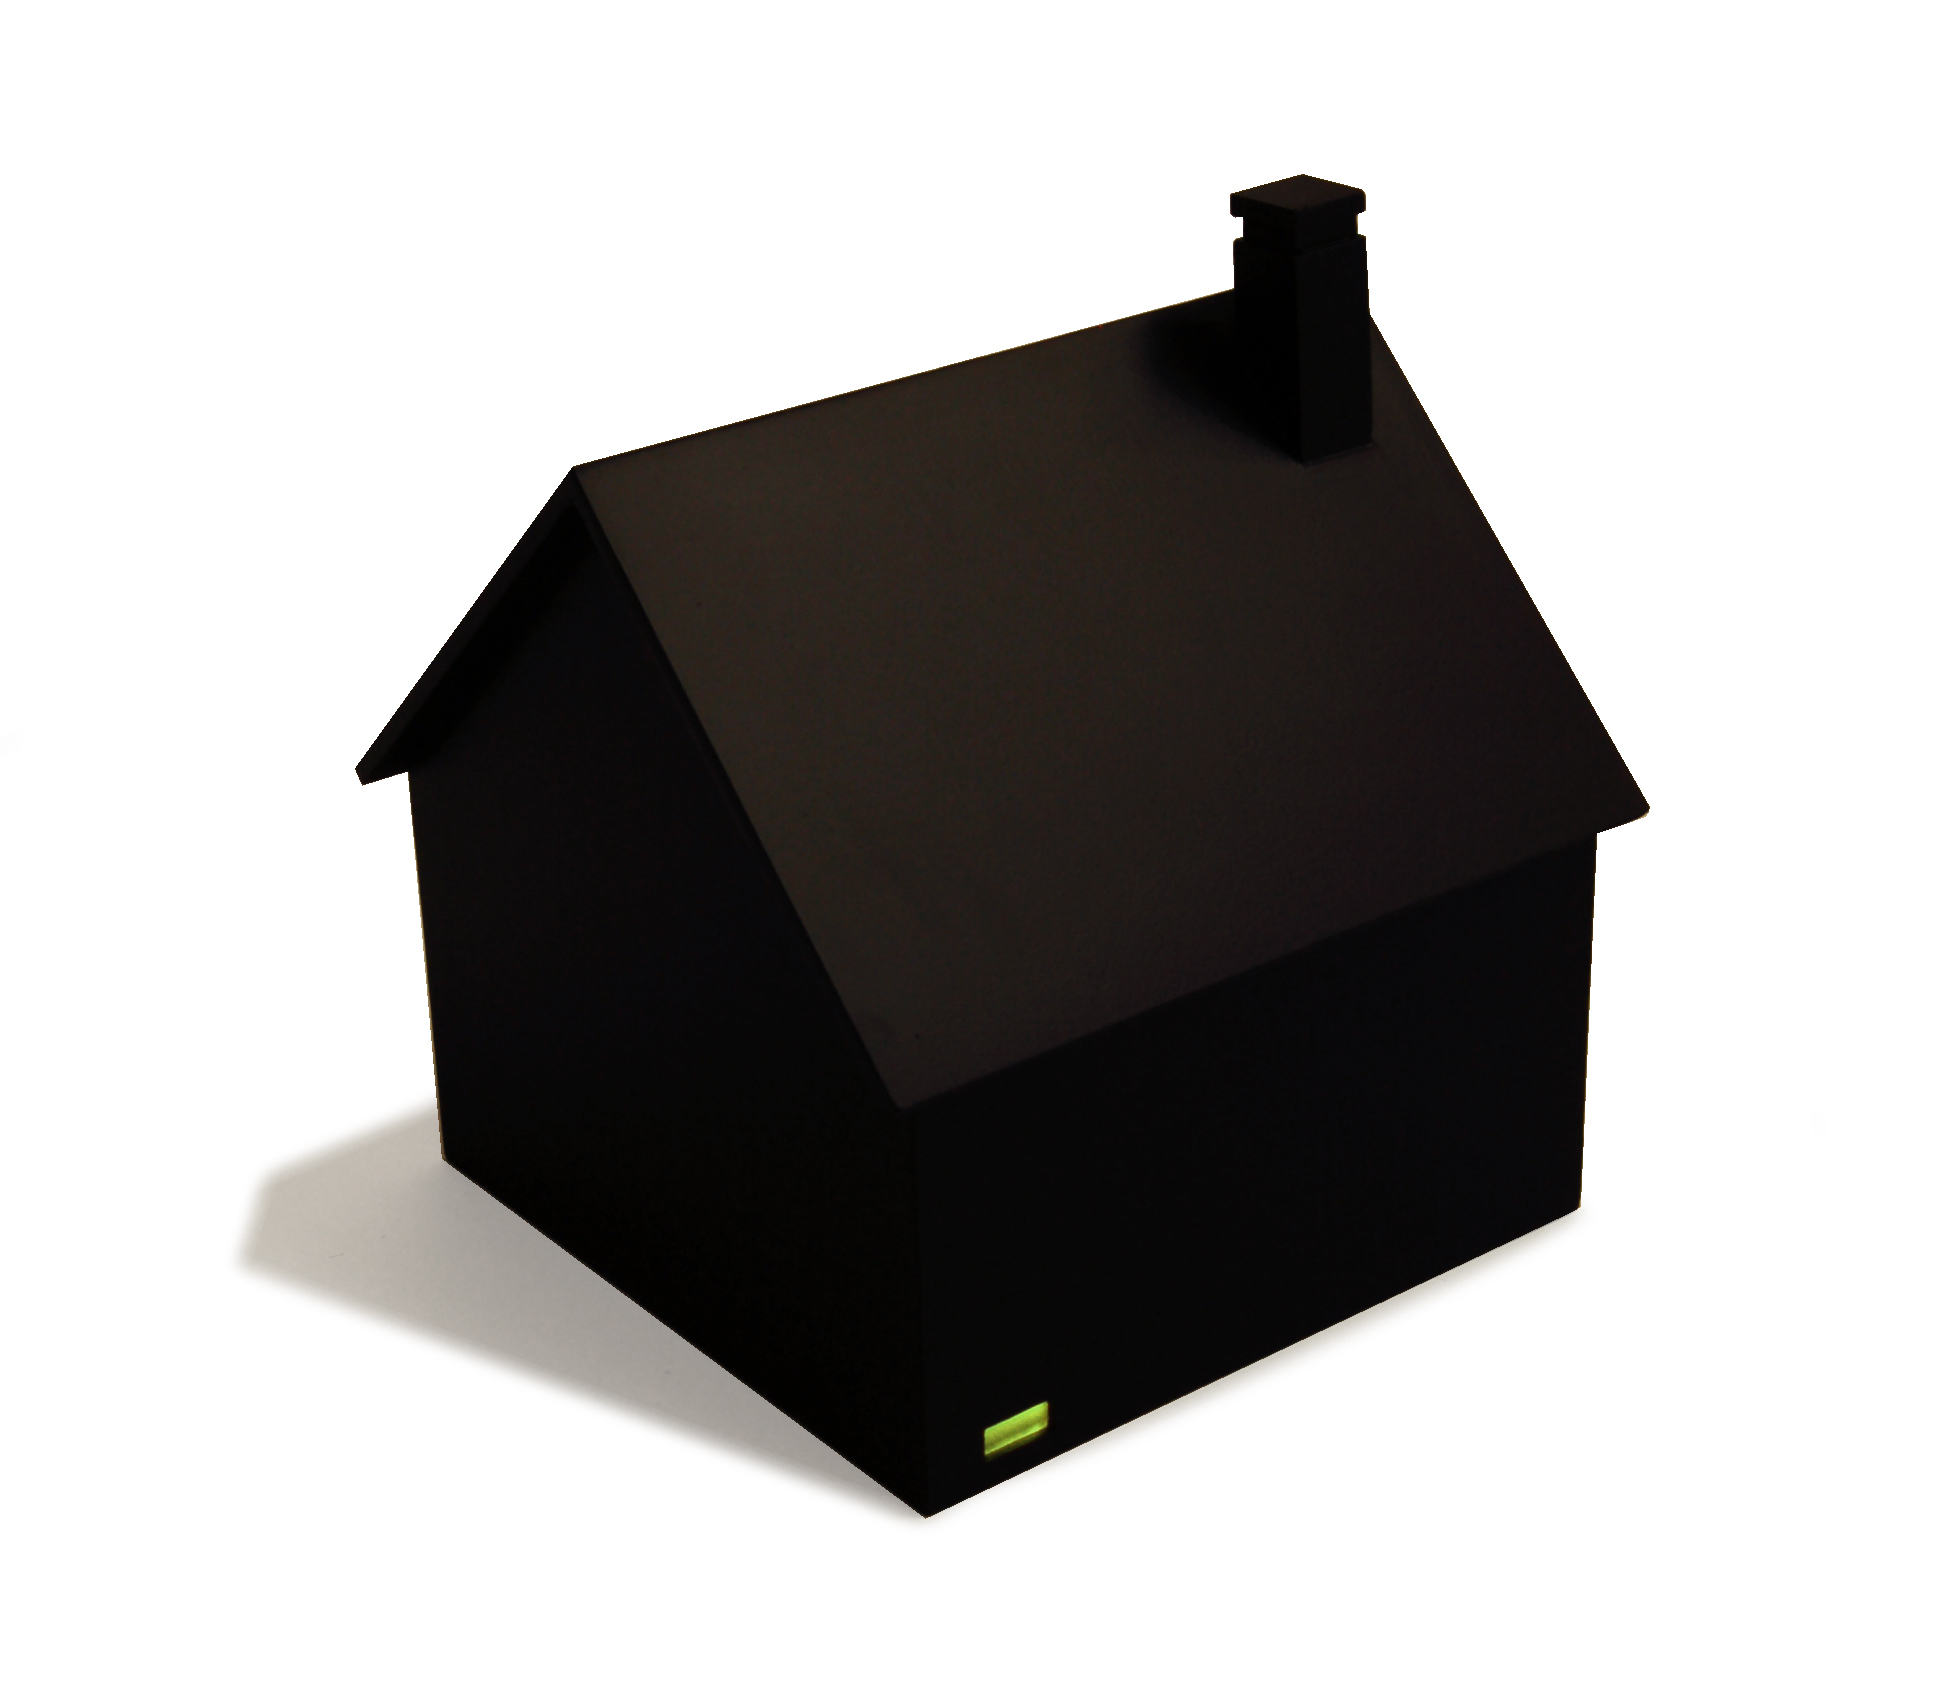 "House at Night I (Basement),  2015, 11"" x 11"" x 12.5"",painted wood, colored plexiglass, light bulb, battery."